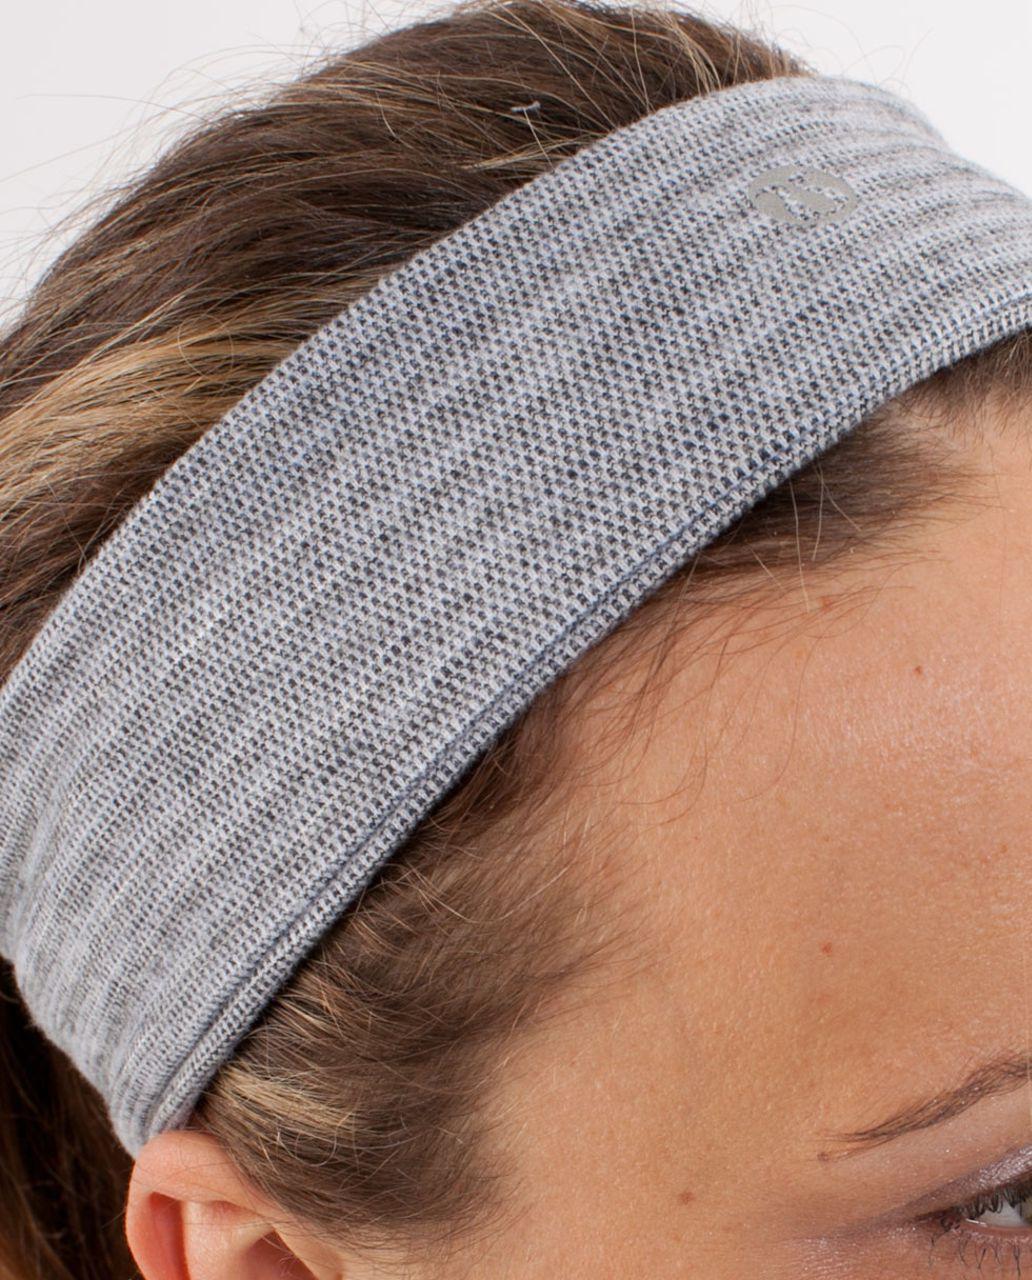 Lululemon Lucky Luon Headband - Deep Coal Silver Spoon Pique